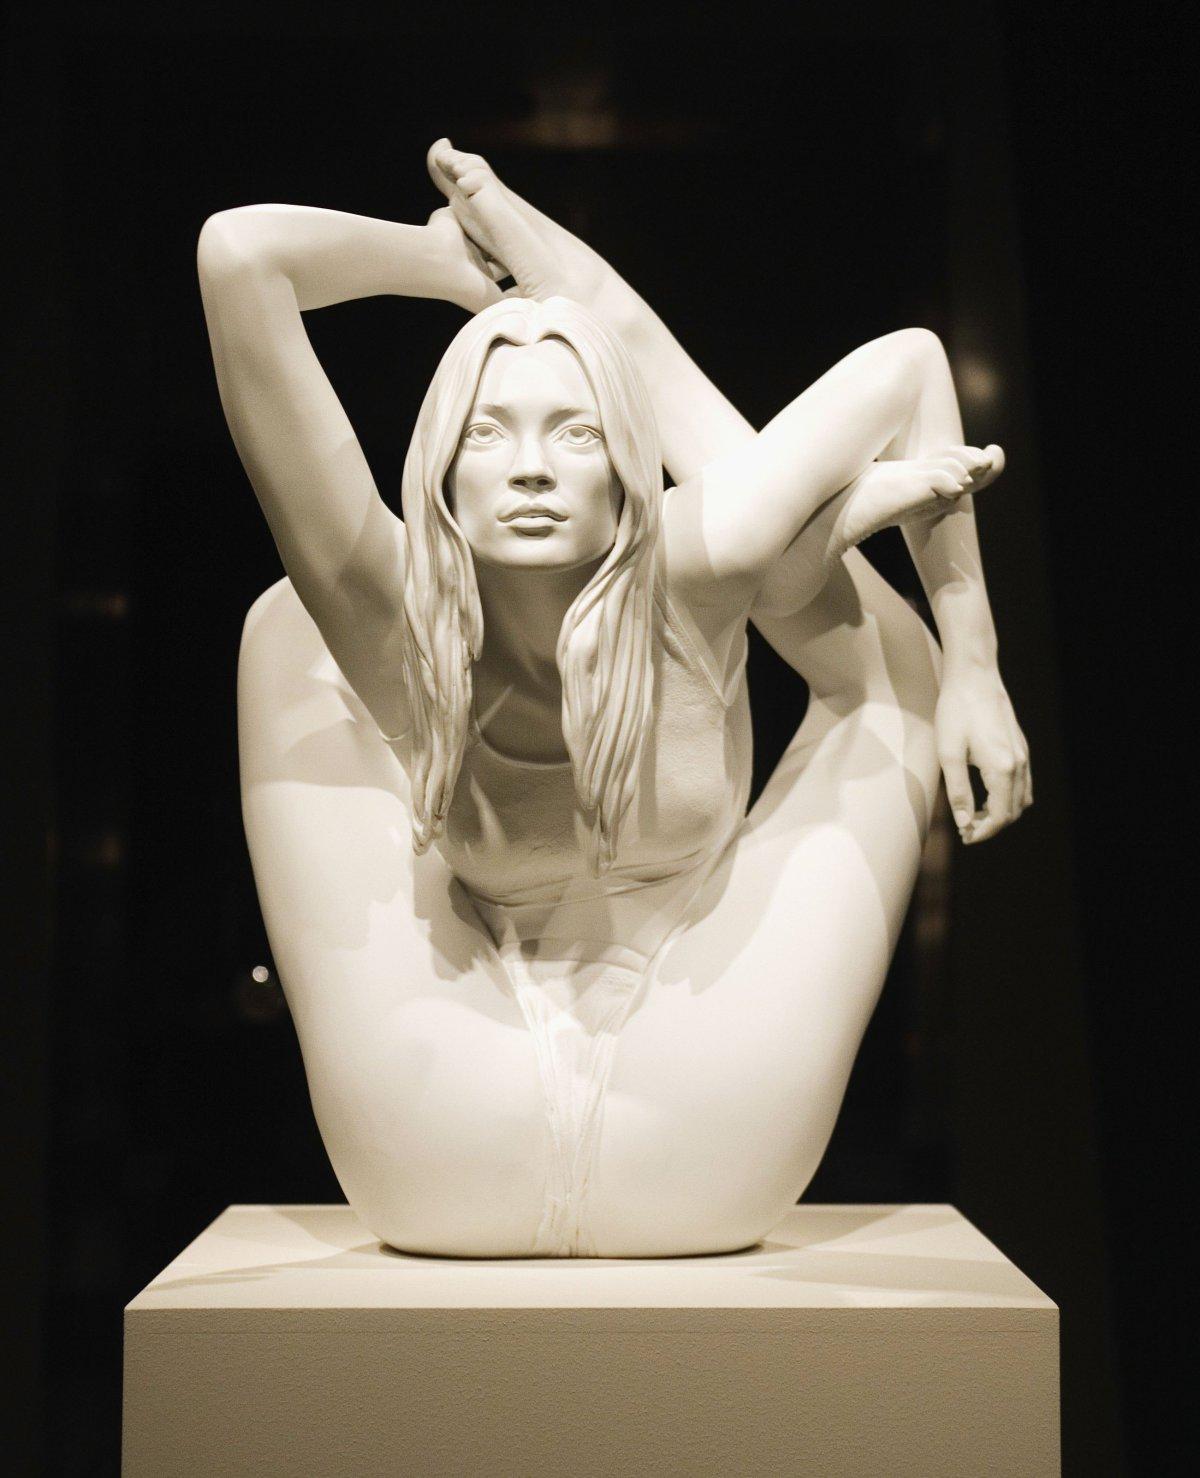 Britney Image Spear Upskirt